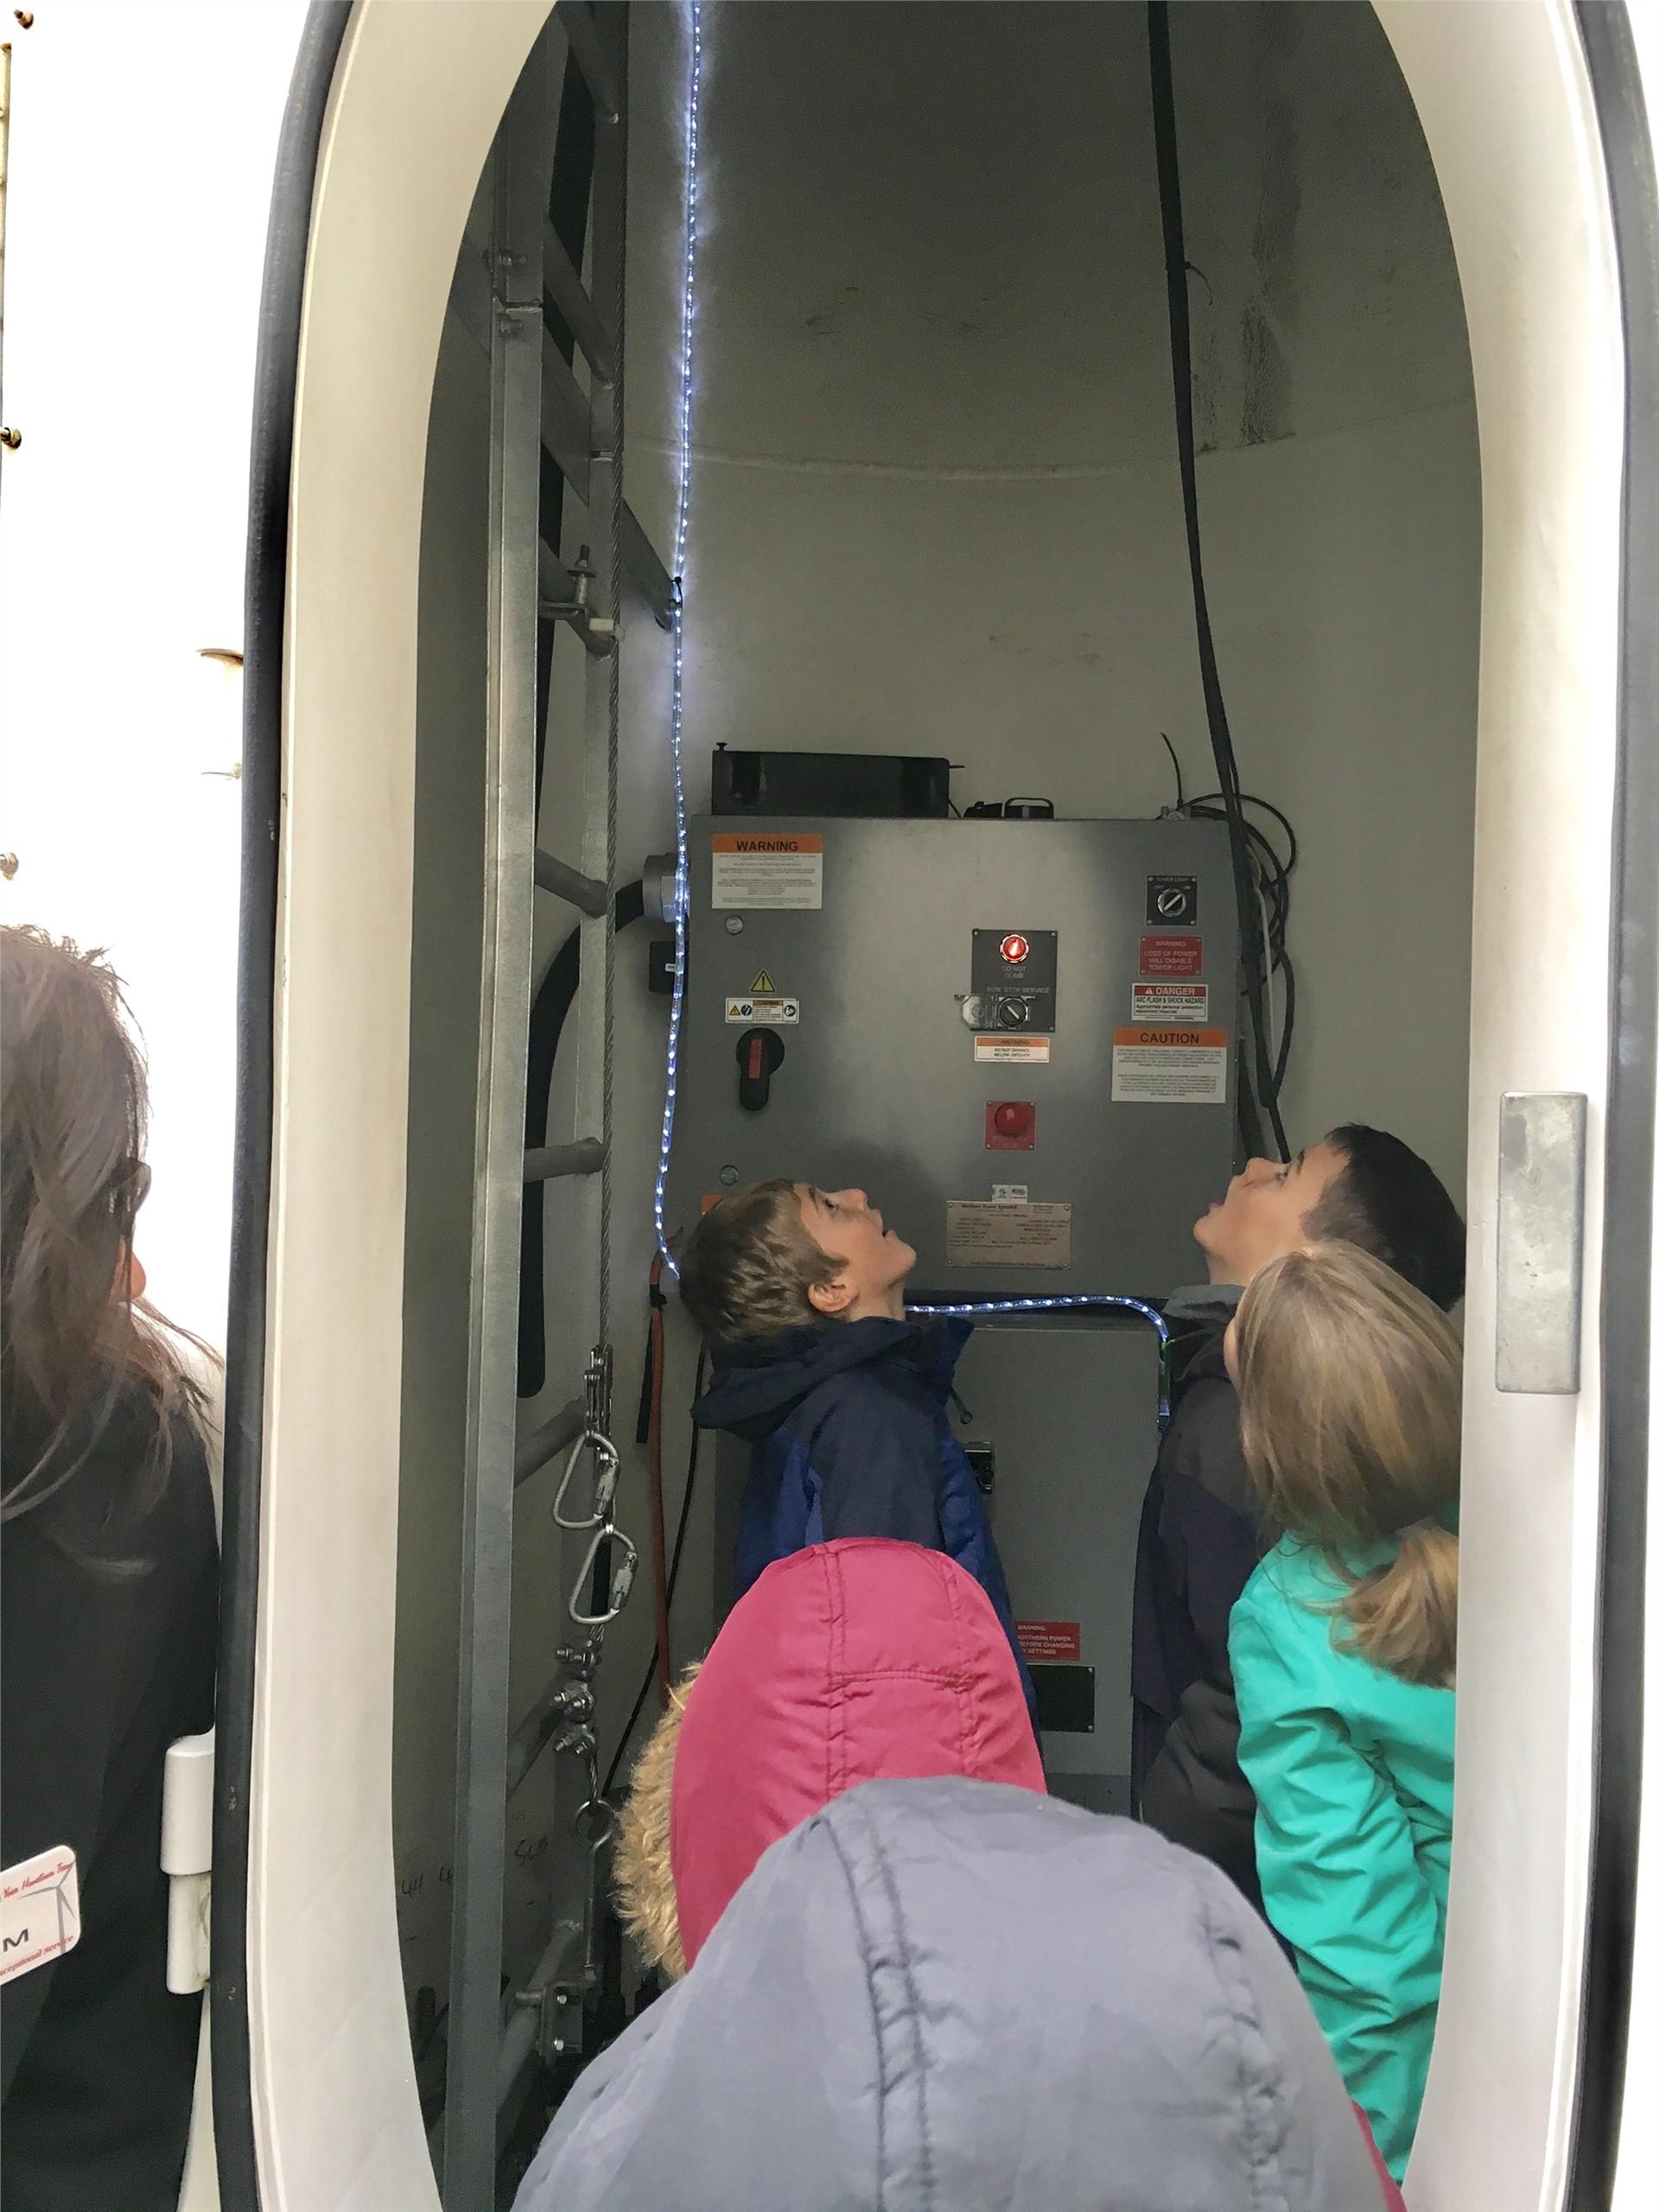 Inside the wind turbine